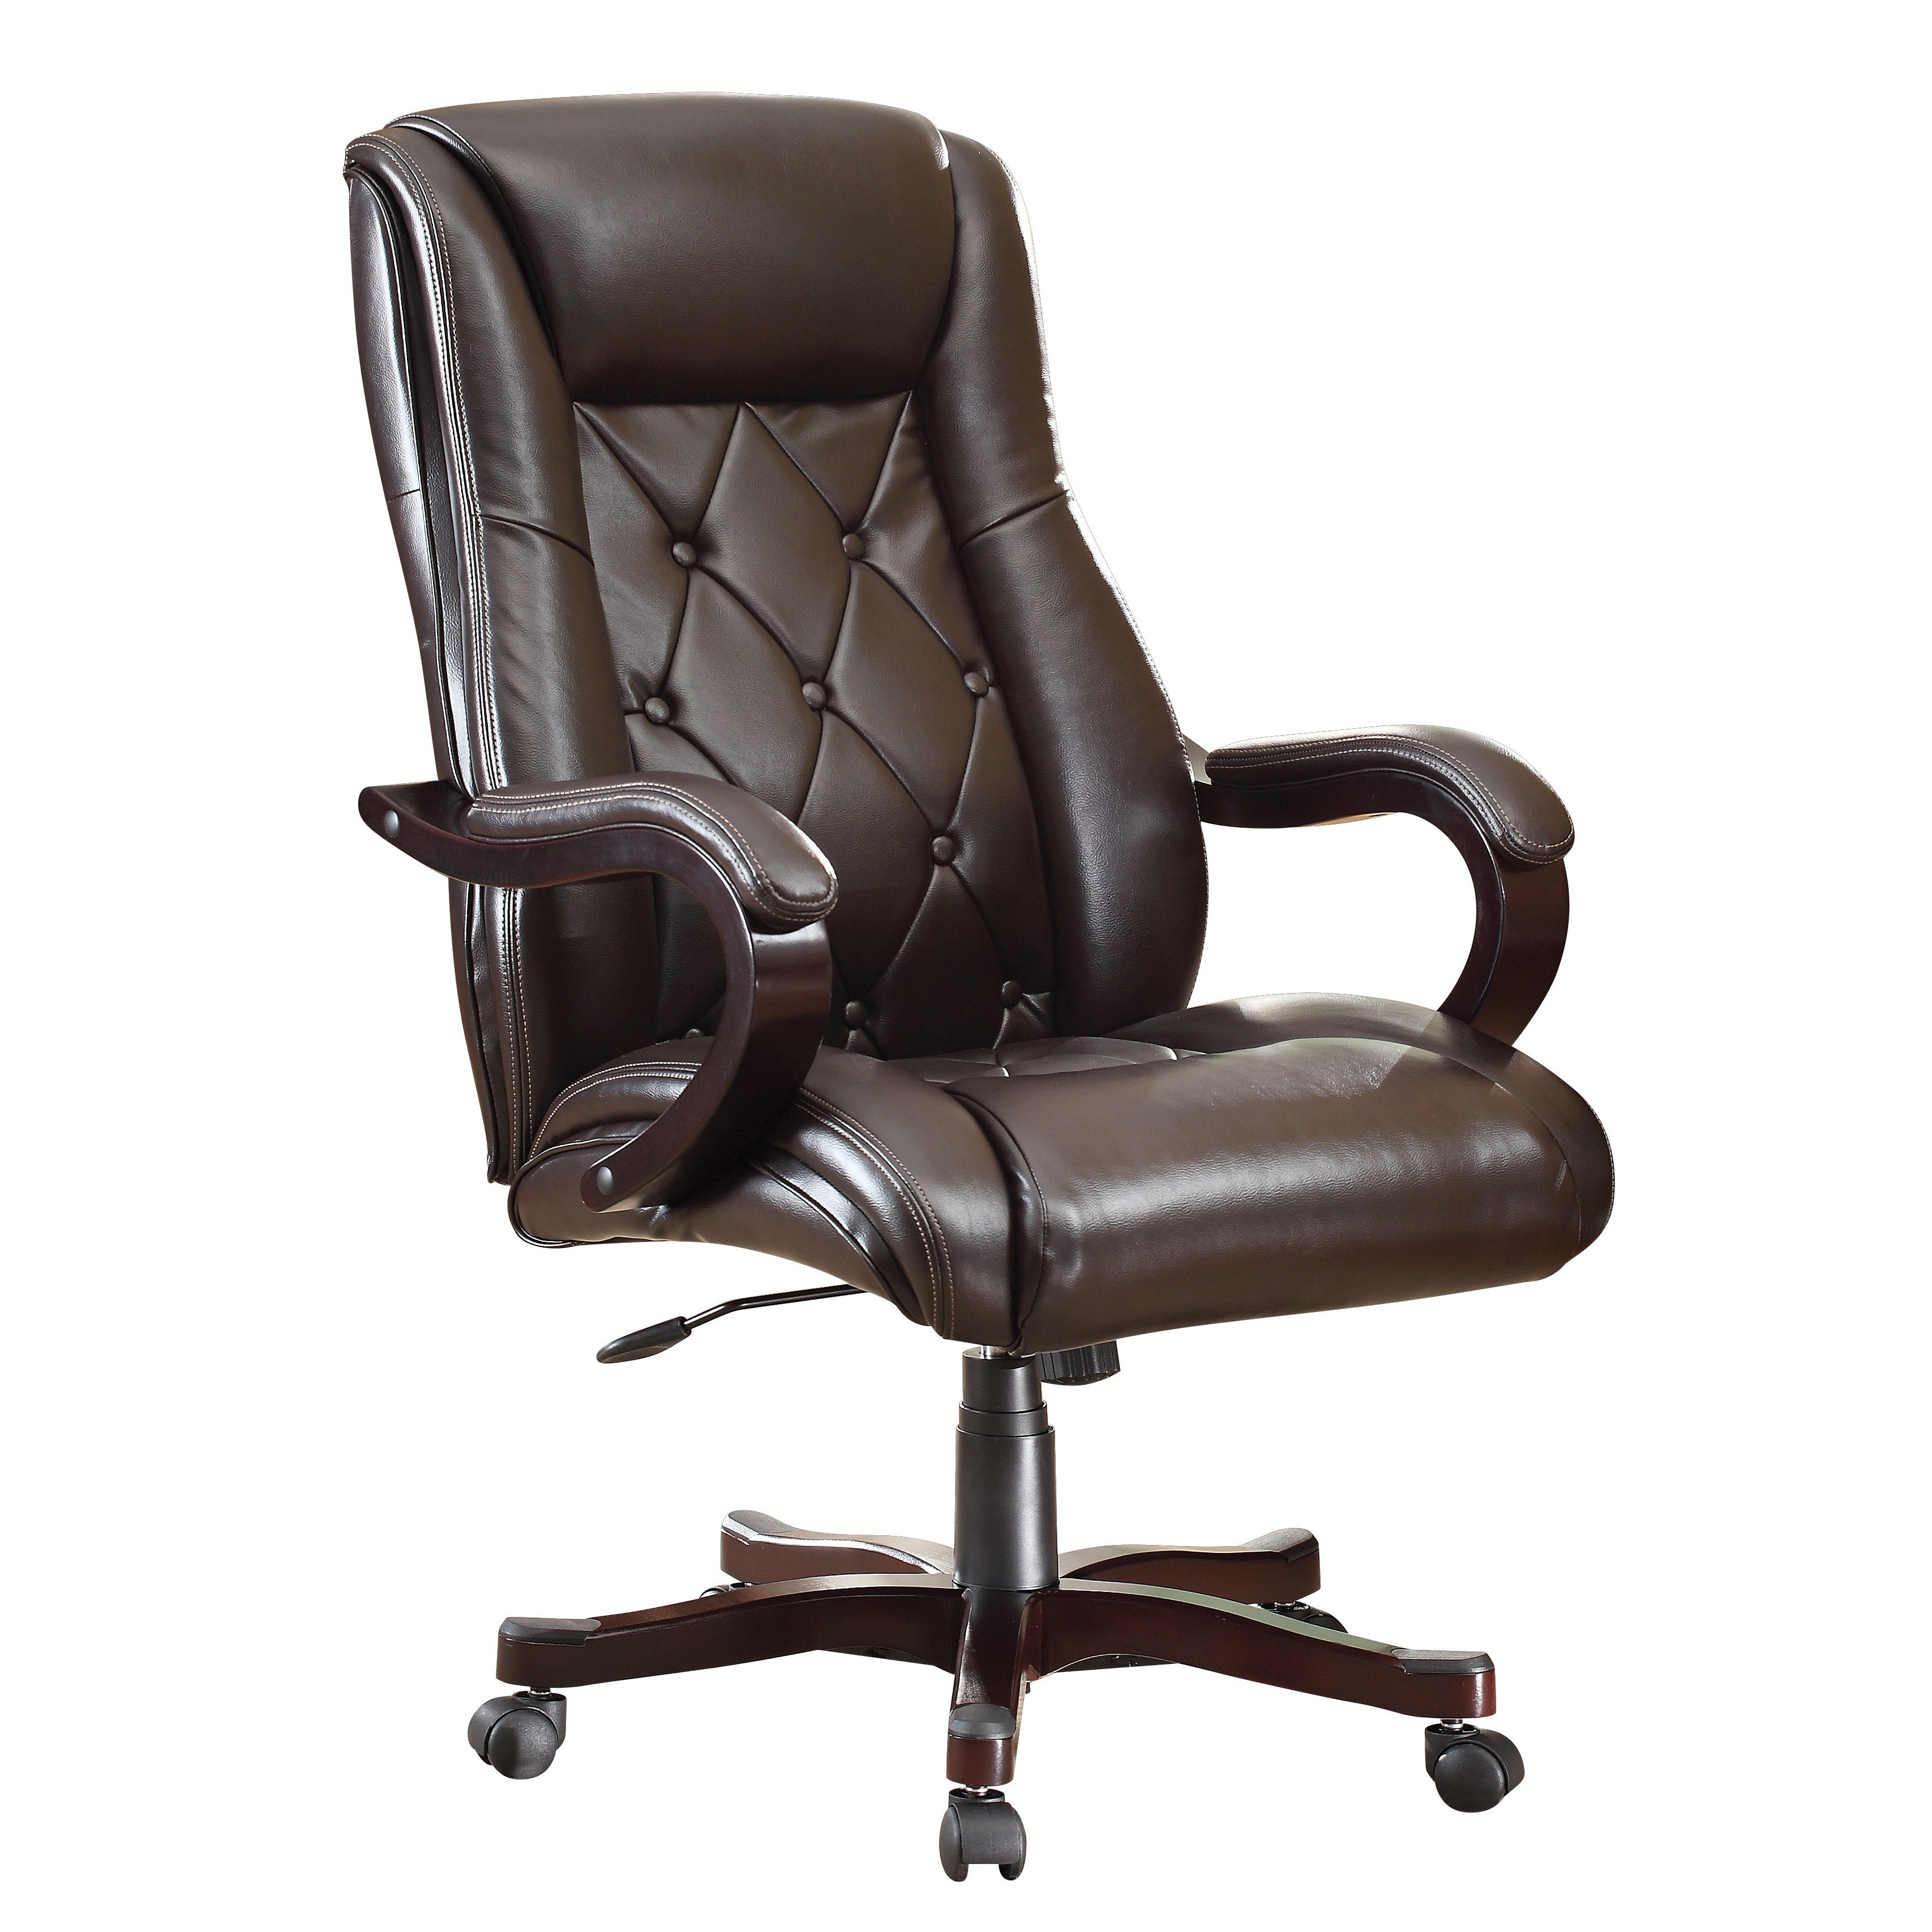 Executive Leather Office Chair Burostuhle Stuhle Buero Und Sessel